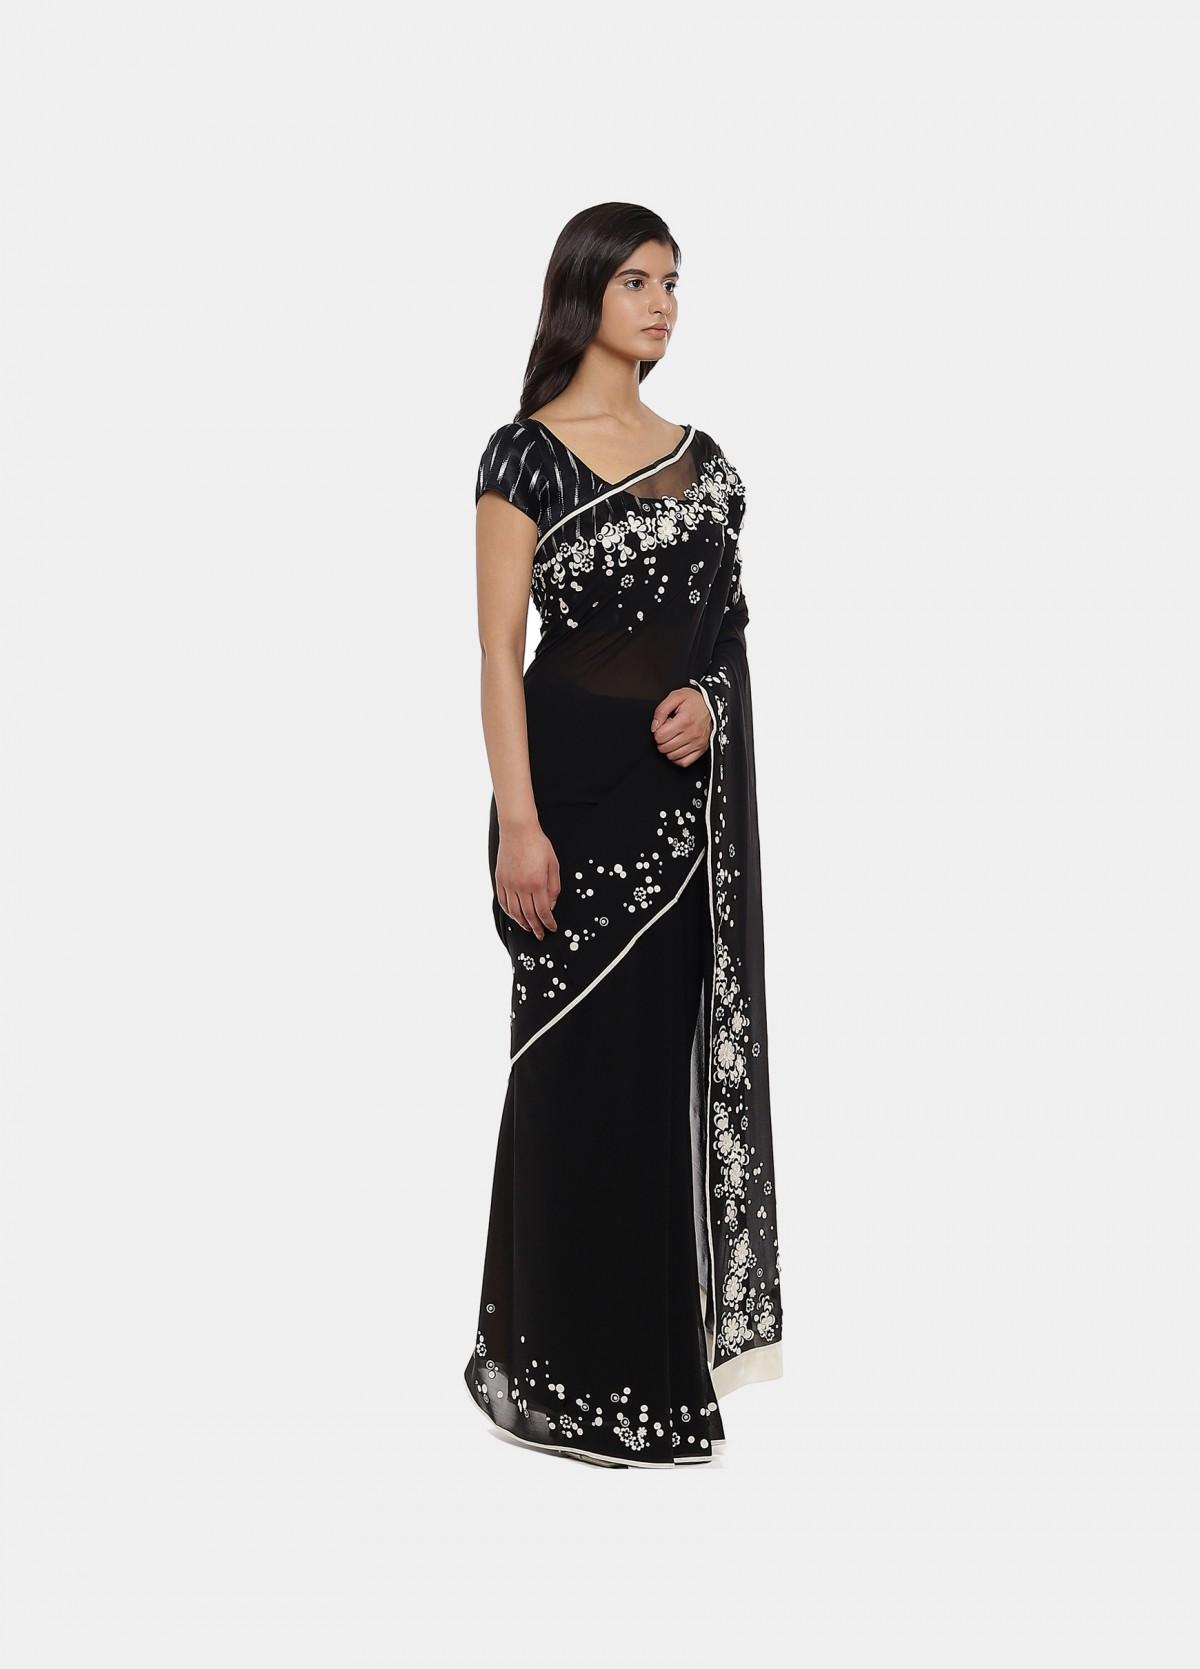 The Firangipani Sari